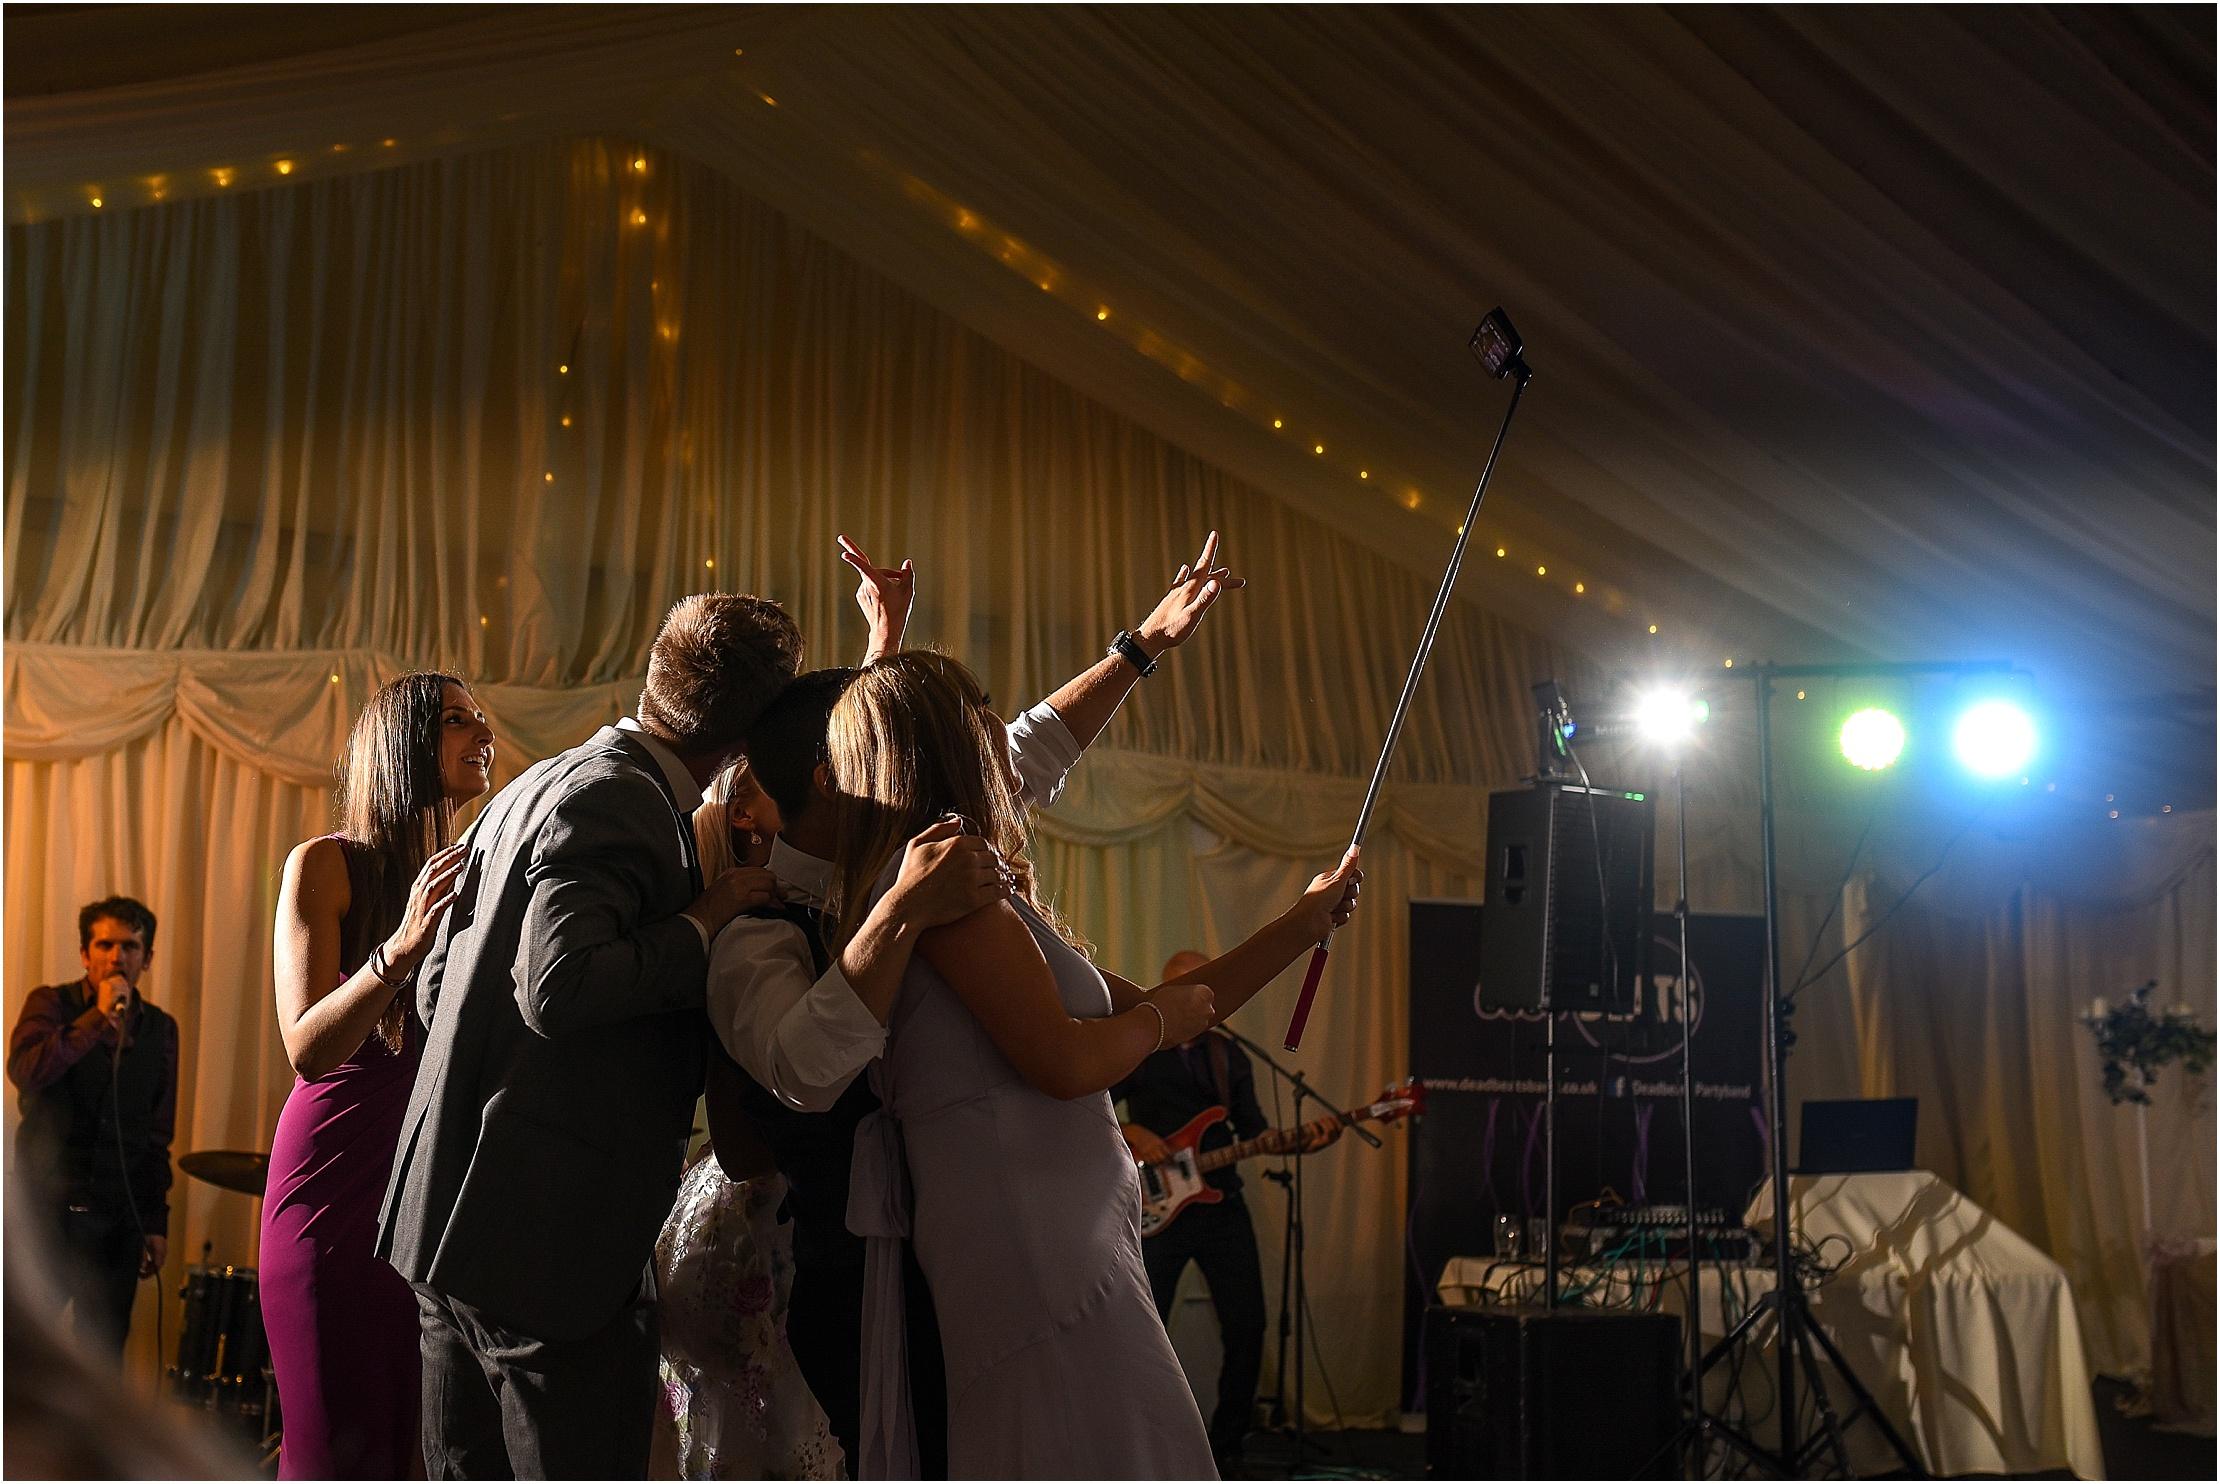 staining-lodge-wedding-122.jpg